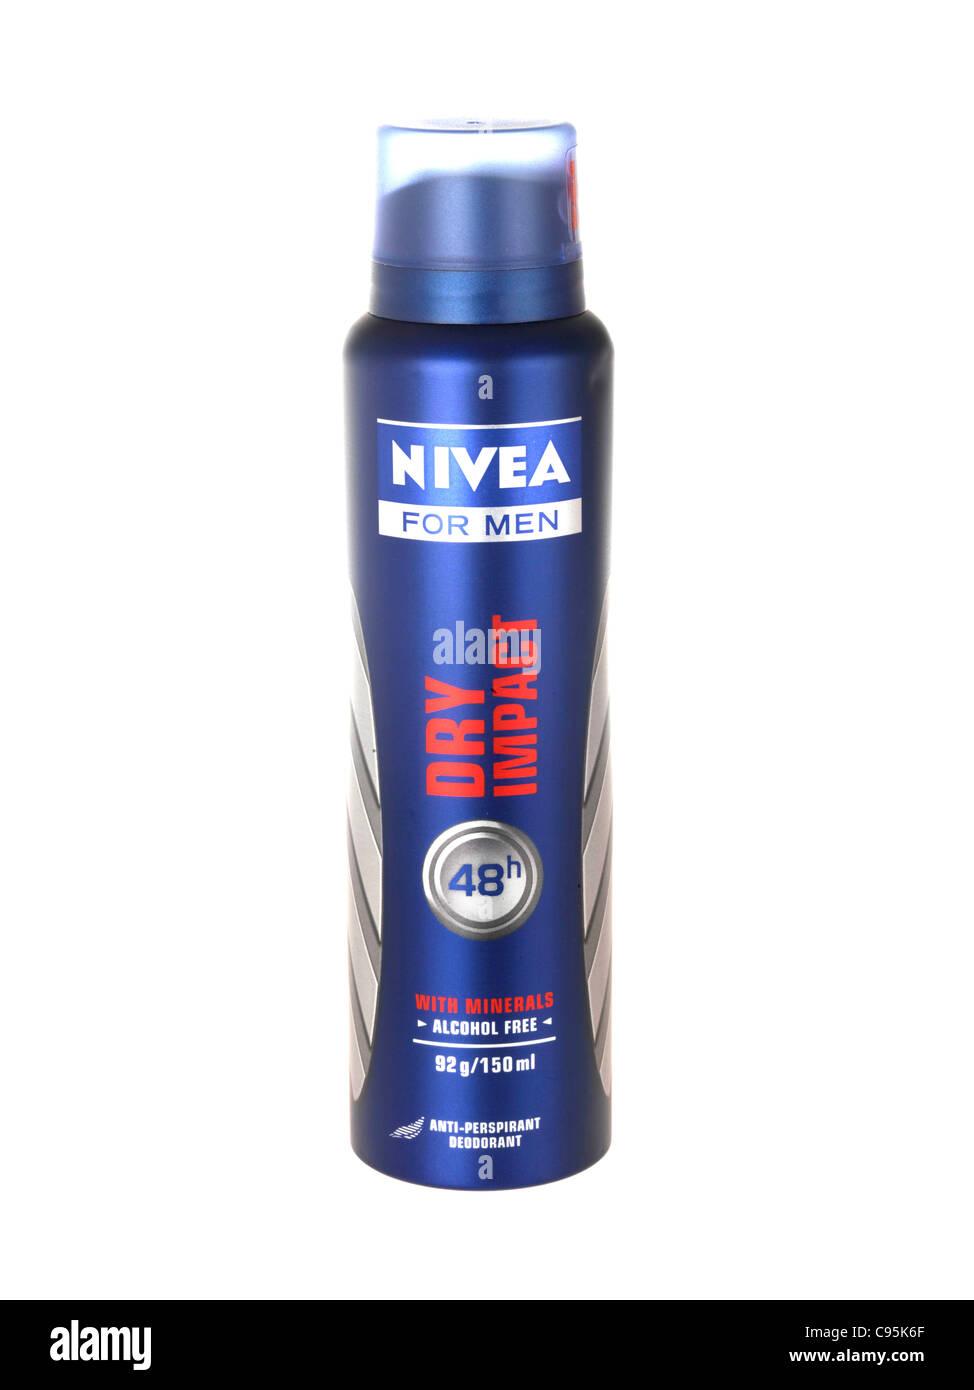 Nivea Dry Impact Deodorant - Stock Image